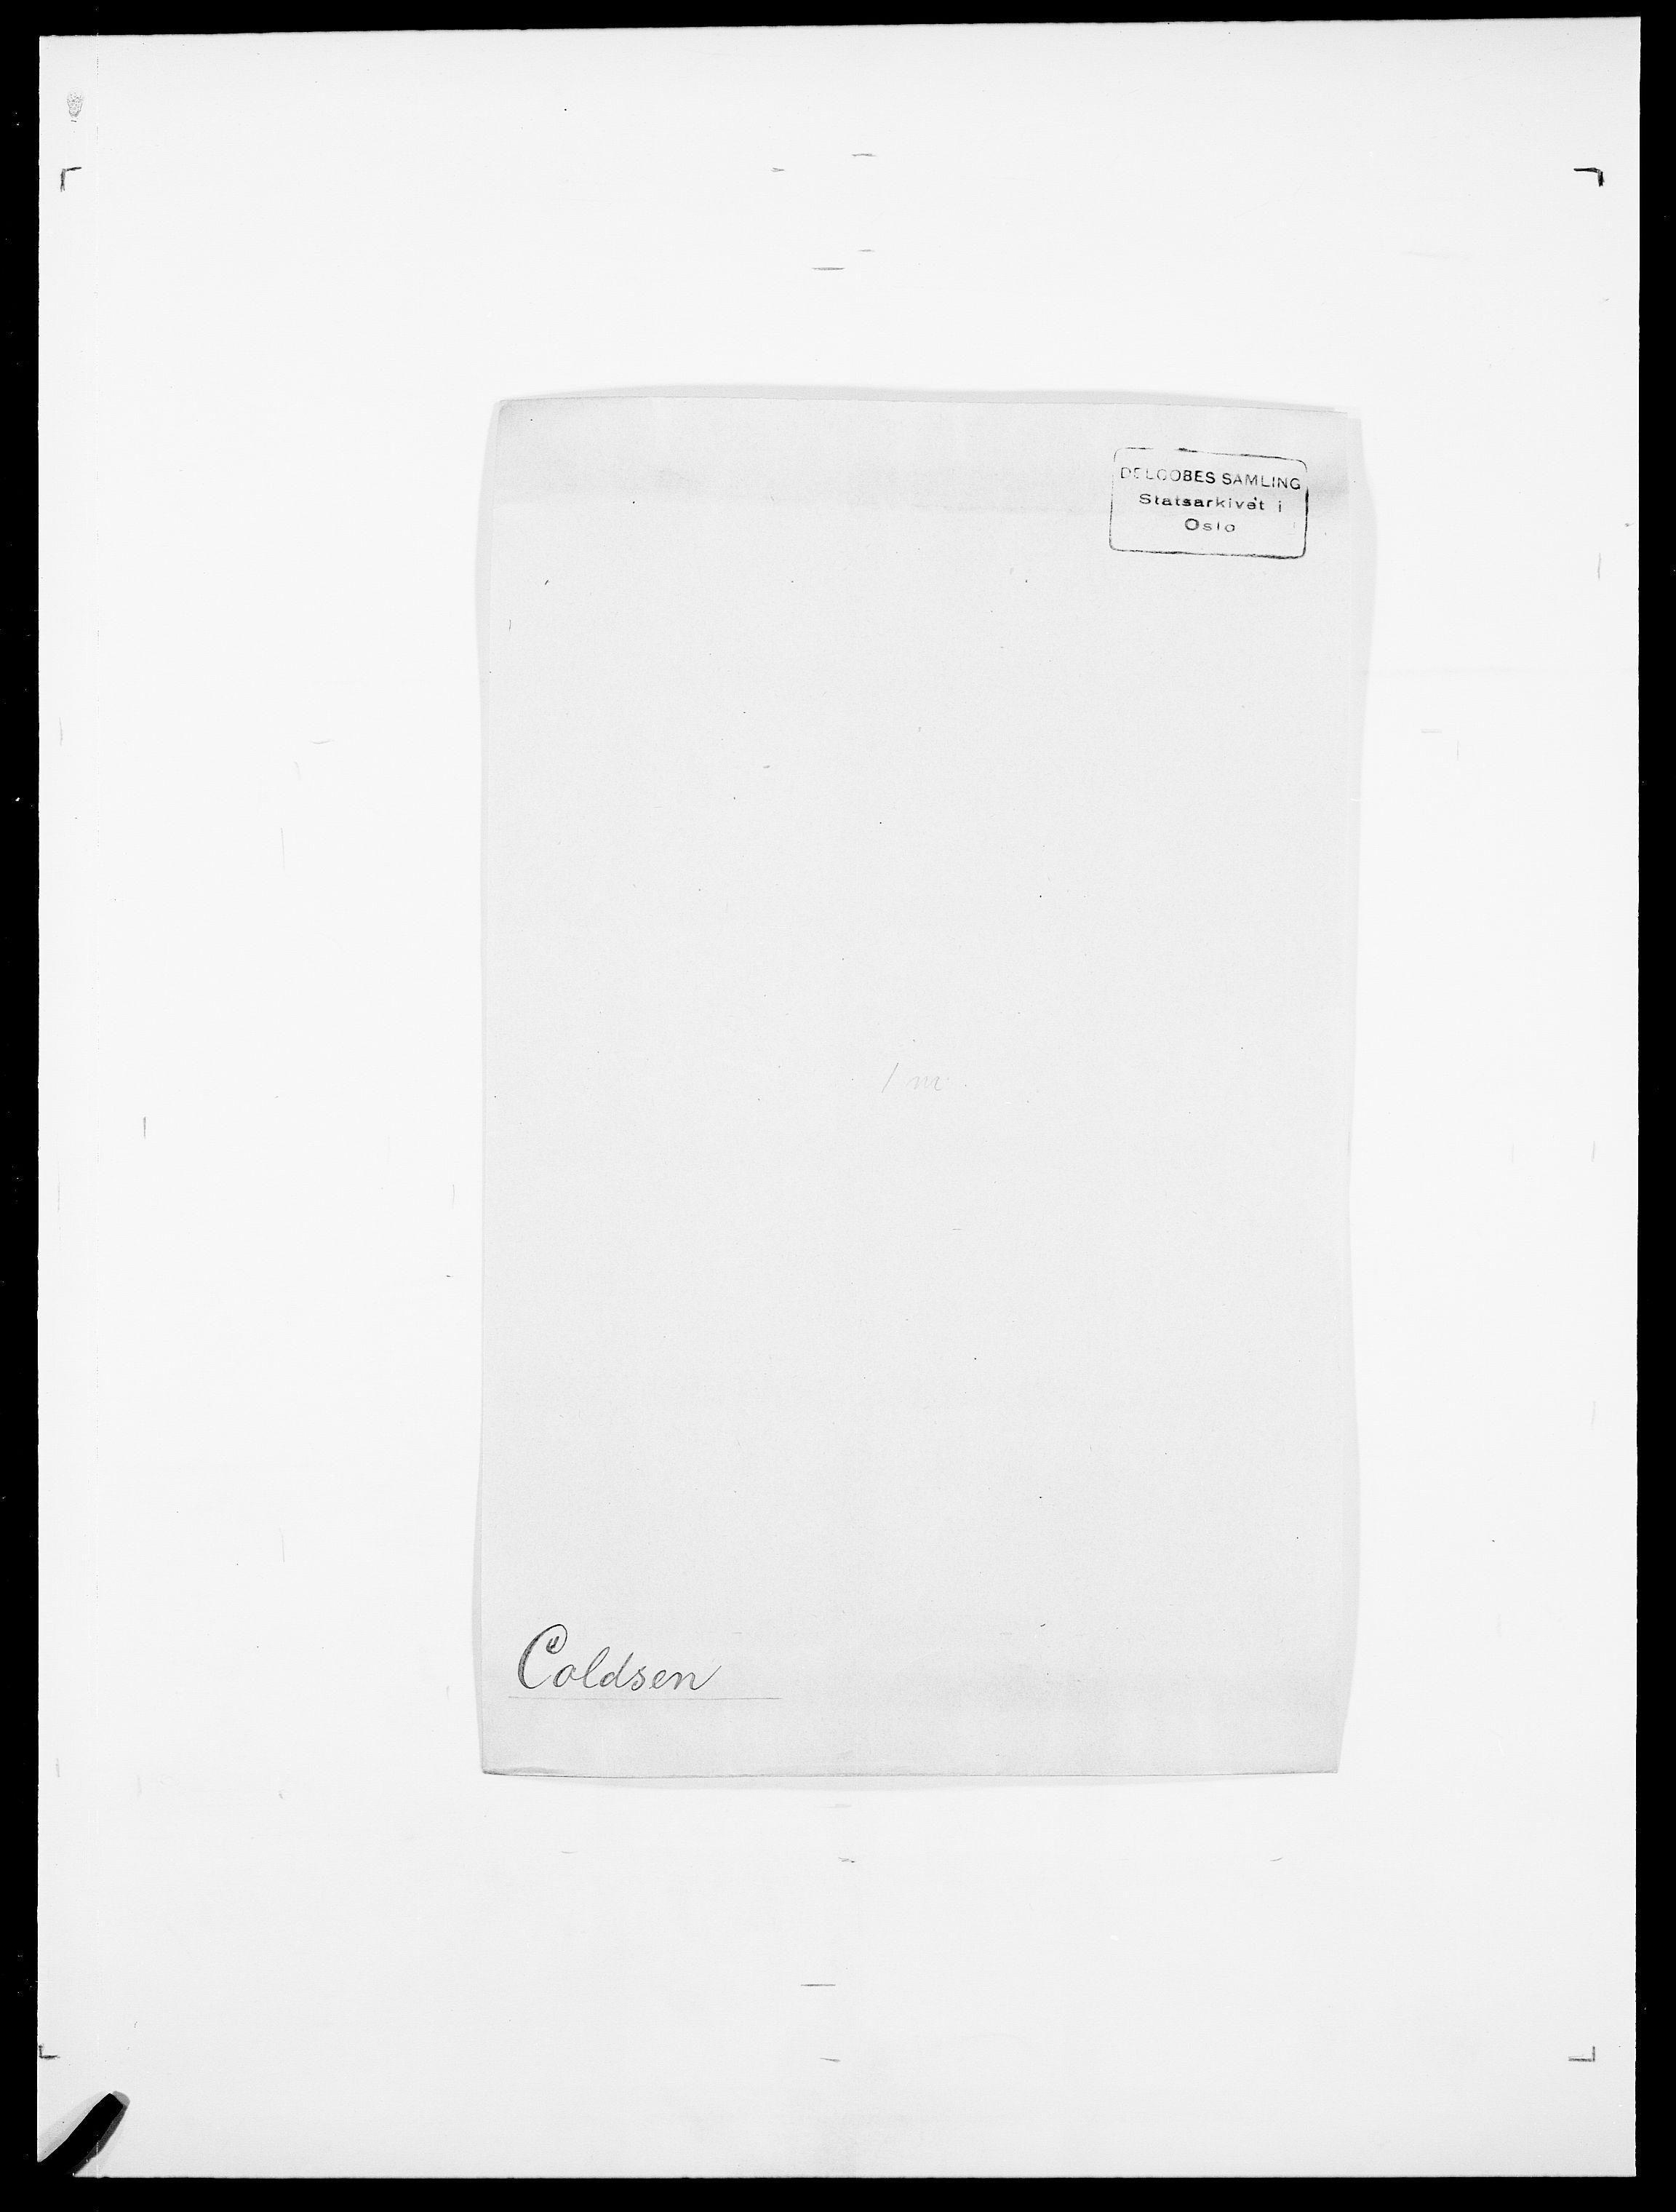 SAO, Delgobe, Charles Antoine - samling, D/Da/L0008: Capjon - Dagenbolt, s. 473